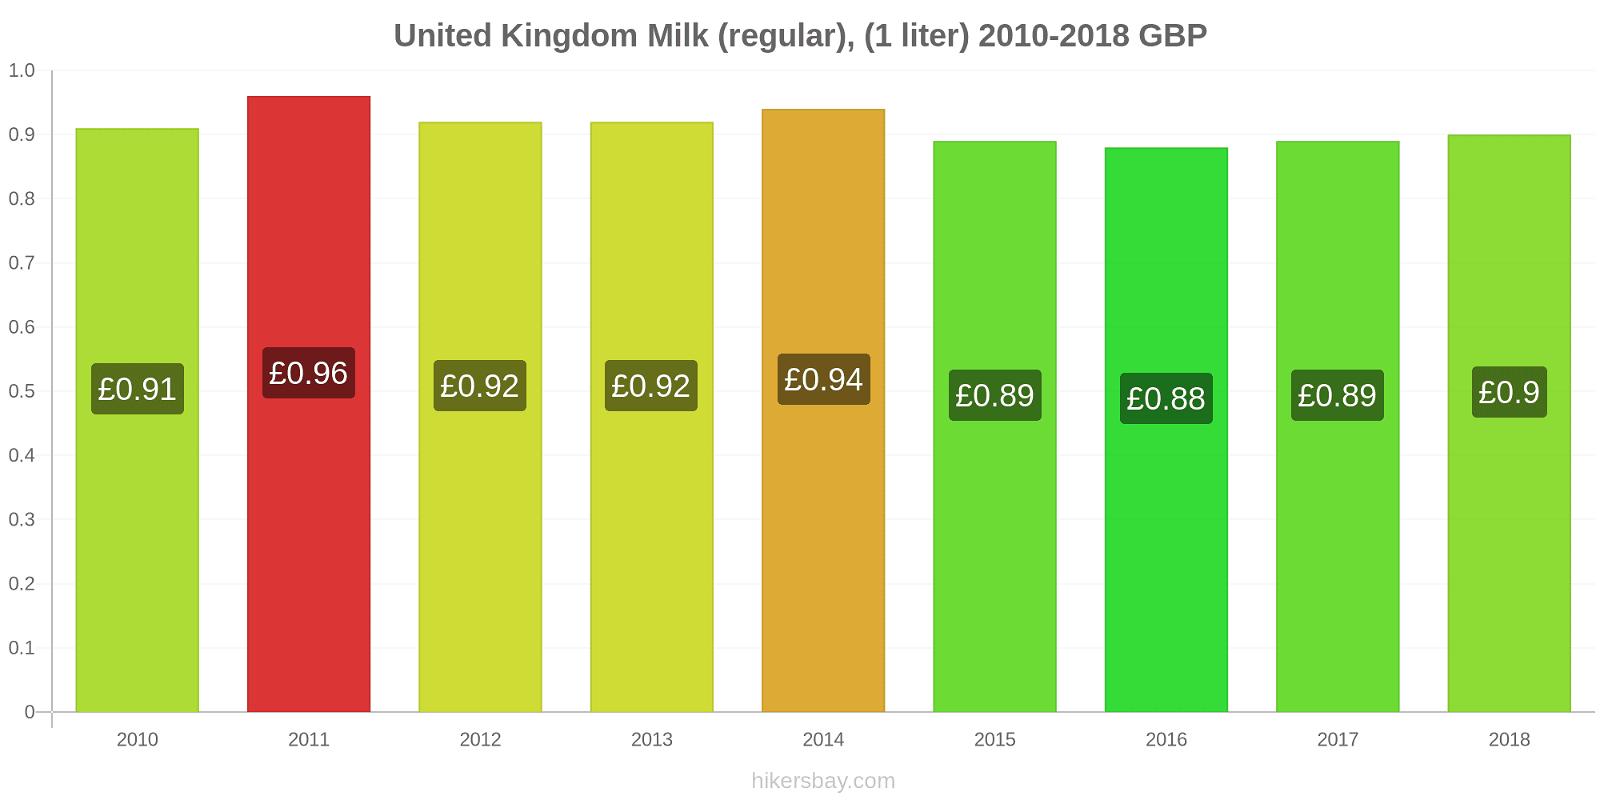 United Kingdom price changes Milk (regular), (1 liter) hikersbay.com